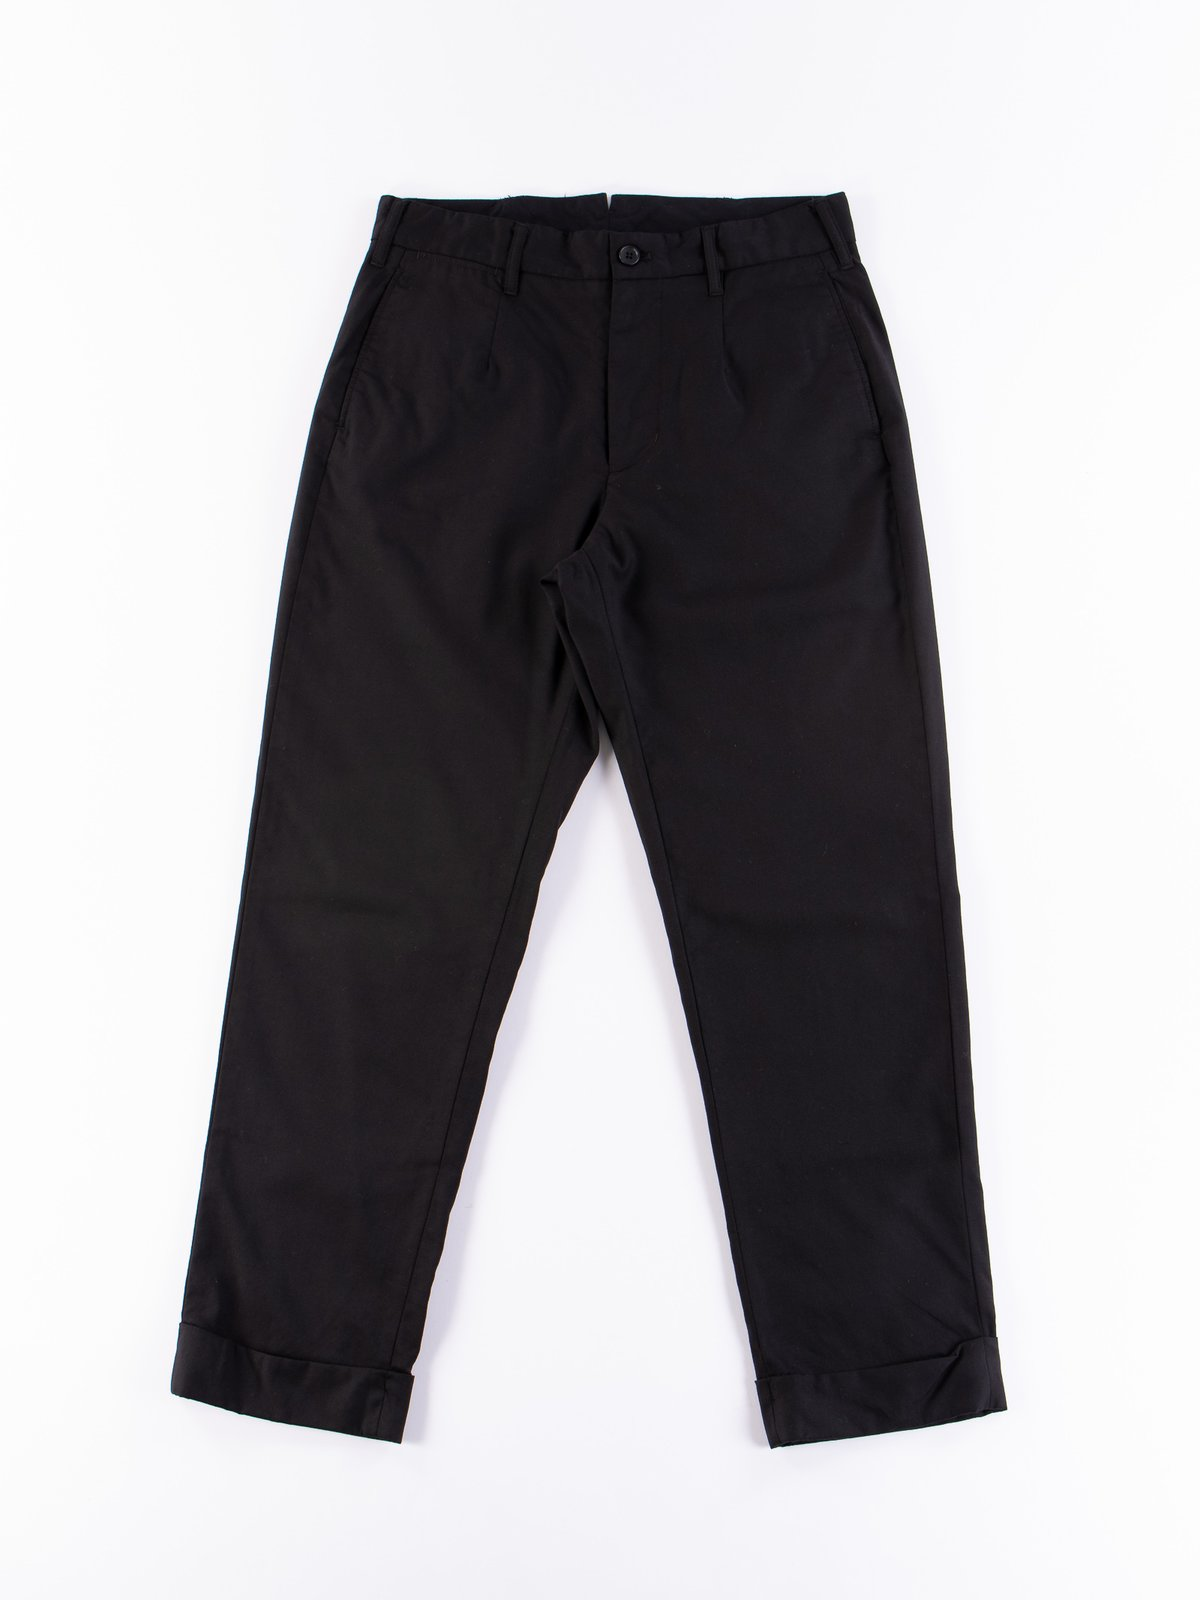 Black Worsted Wool Gabardine Andover Pant - Image 1